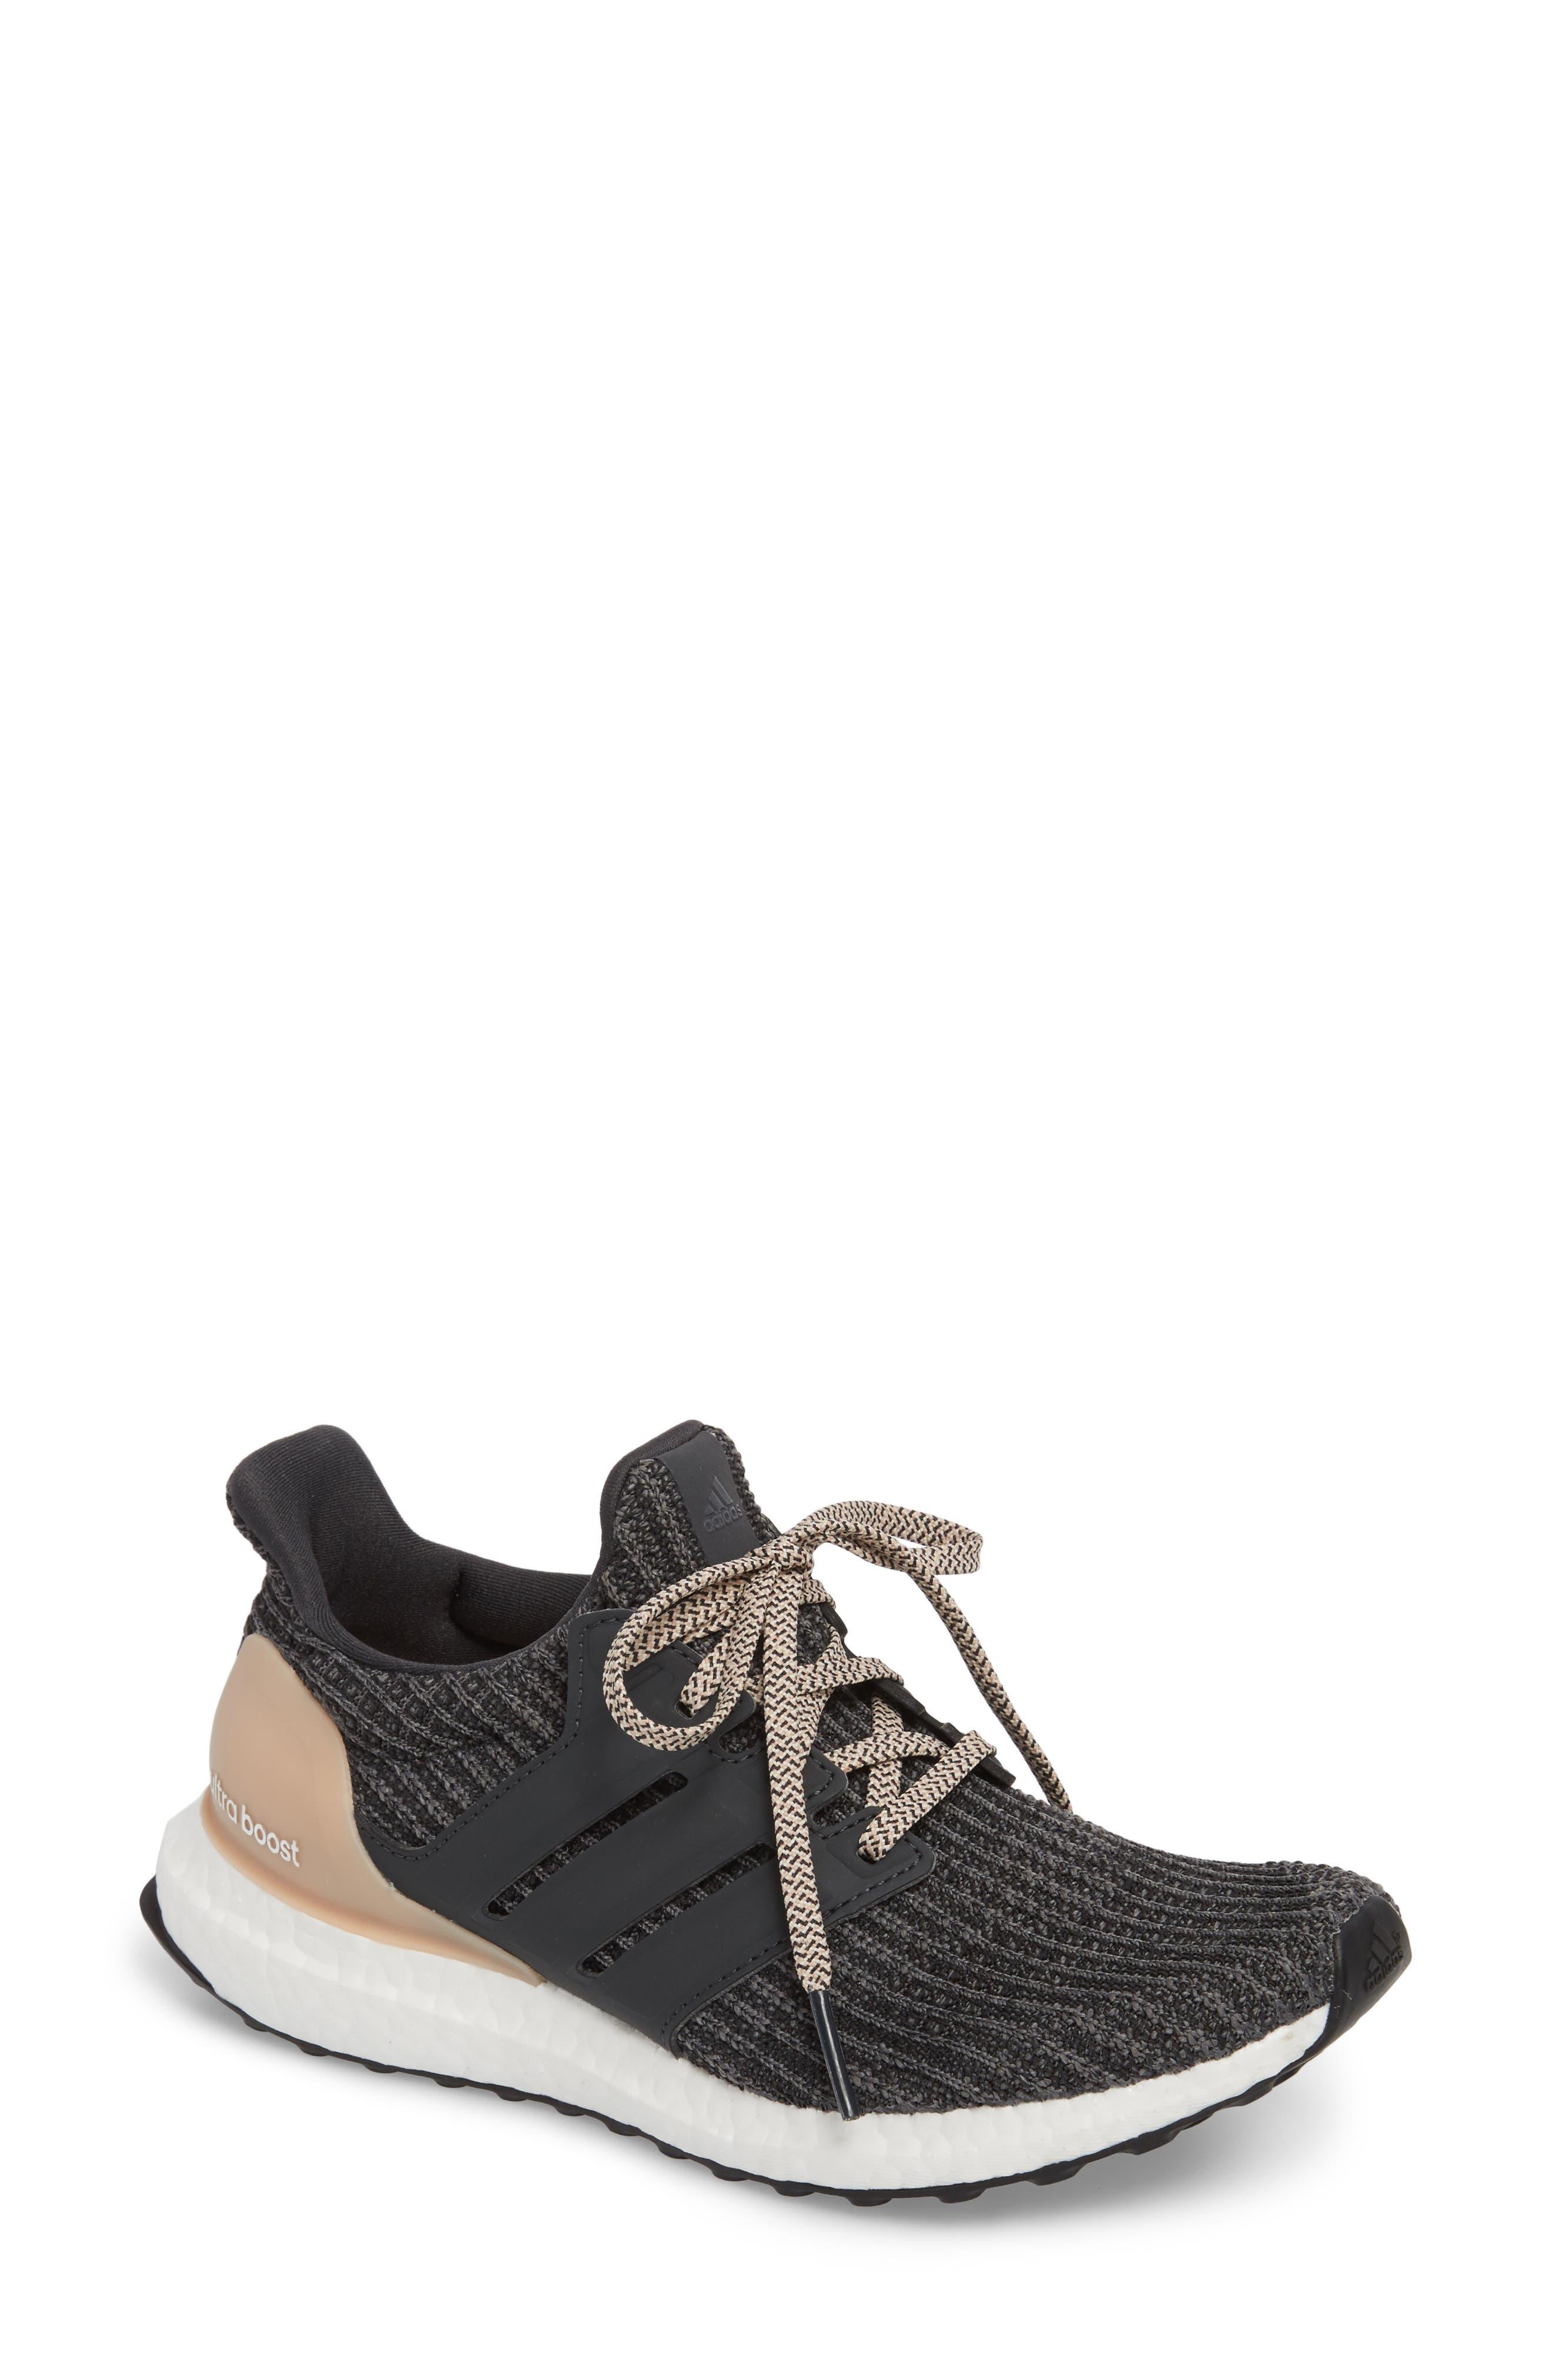 Main Image - adidas \u0027UltraBoost\u0027 Running Shoe ...